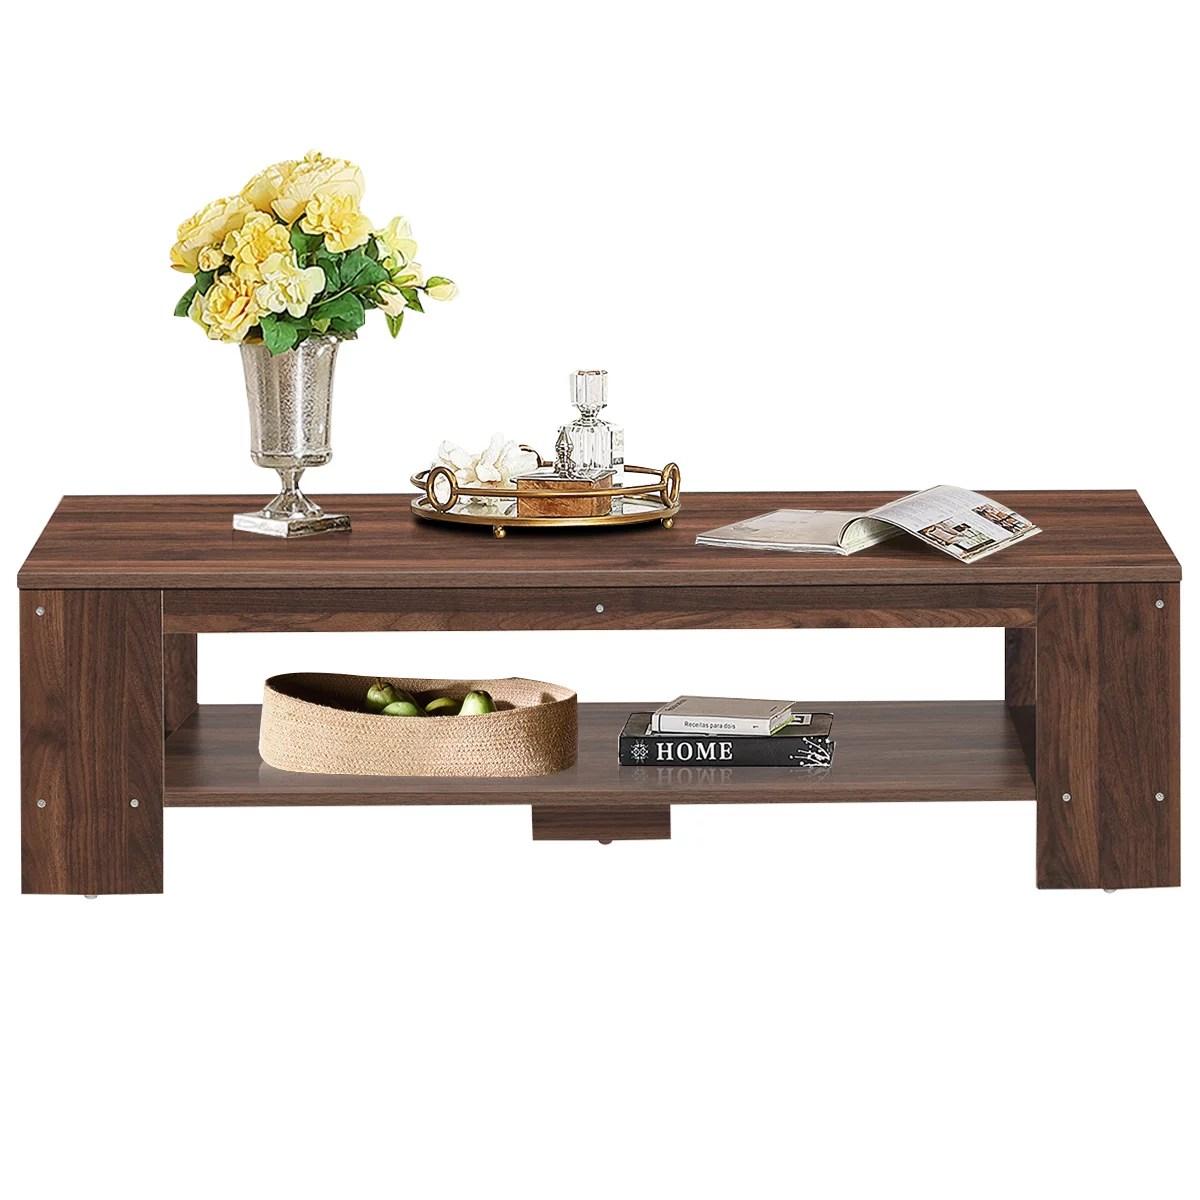 topbuy rustic wood coffee table rectangular coffee table with storage shelf walmart com